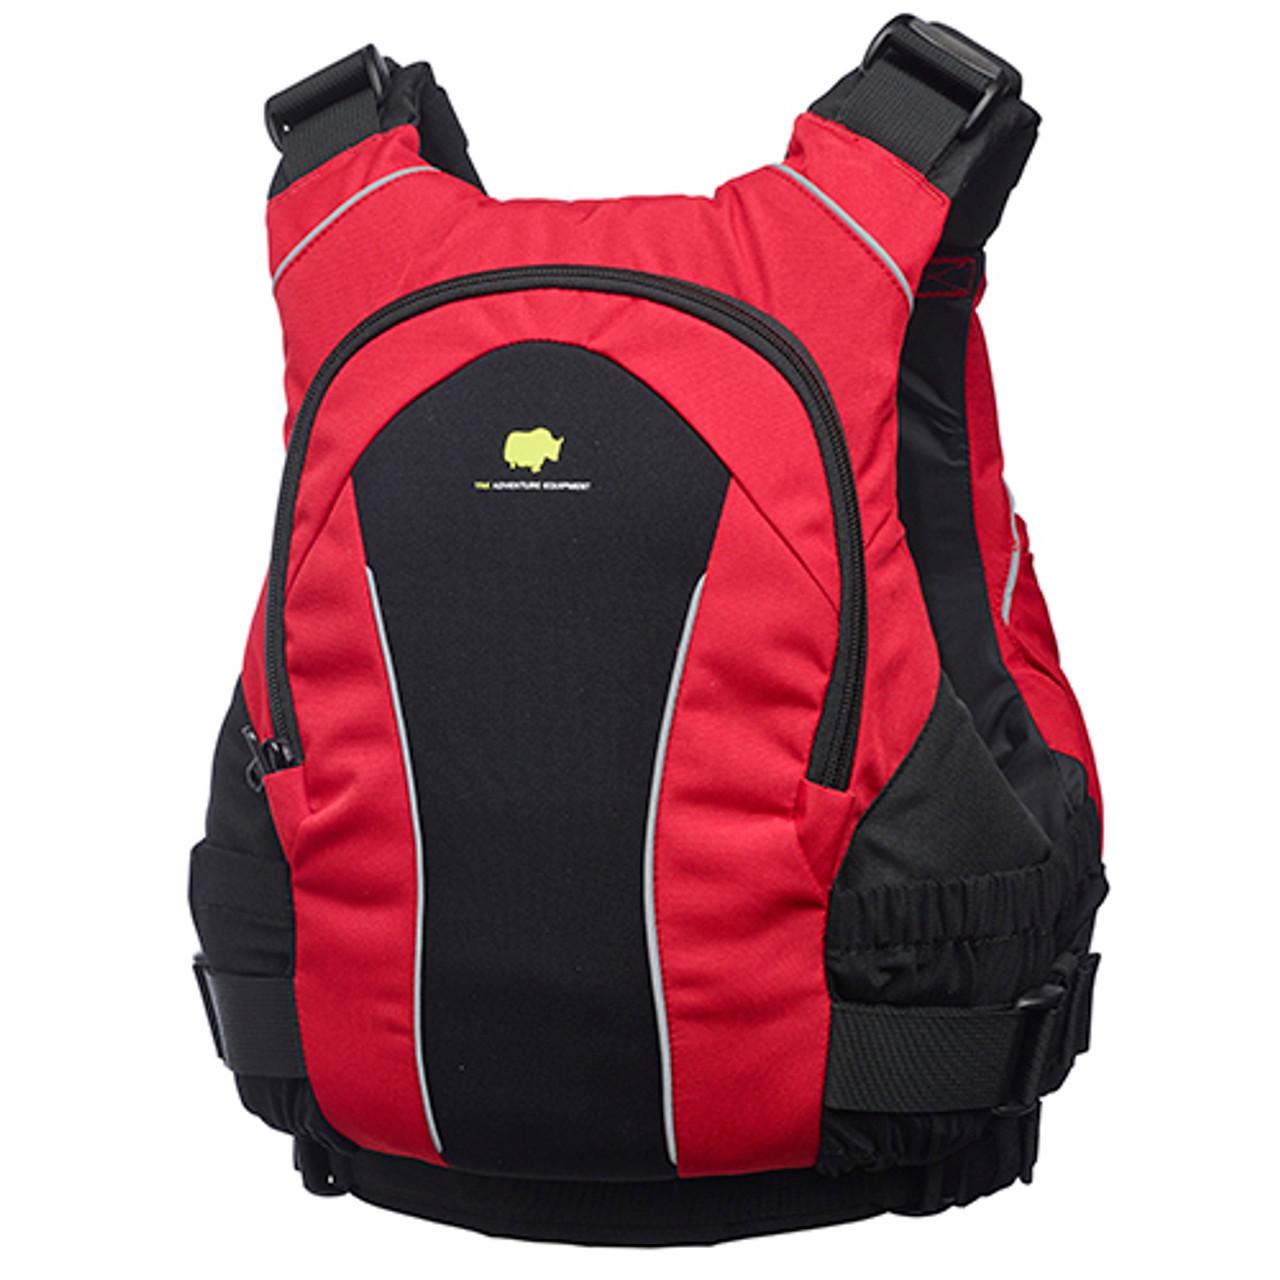 Yak Xipe PFD Red - Back